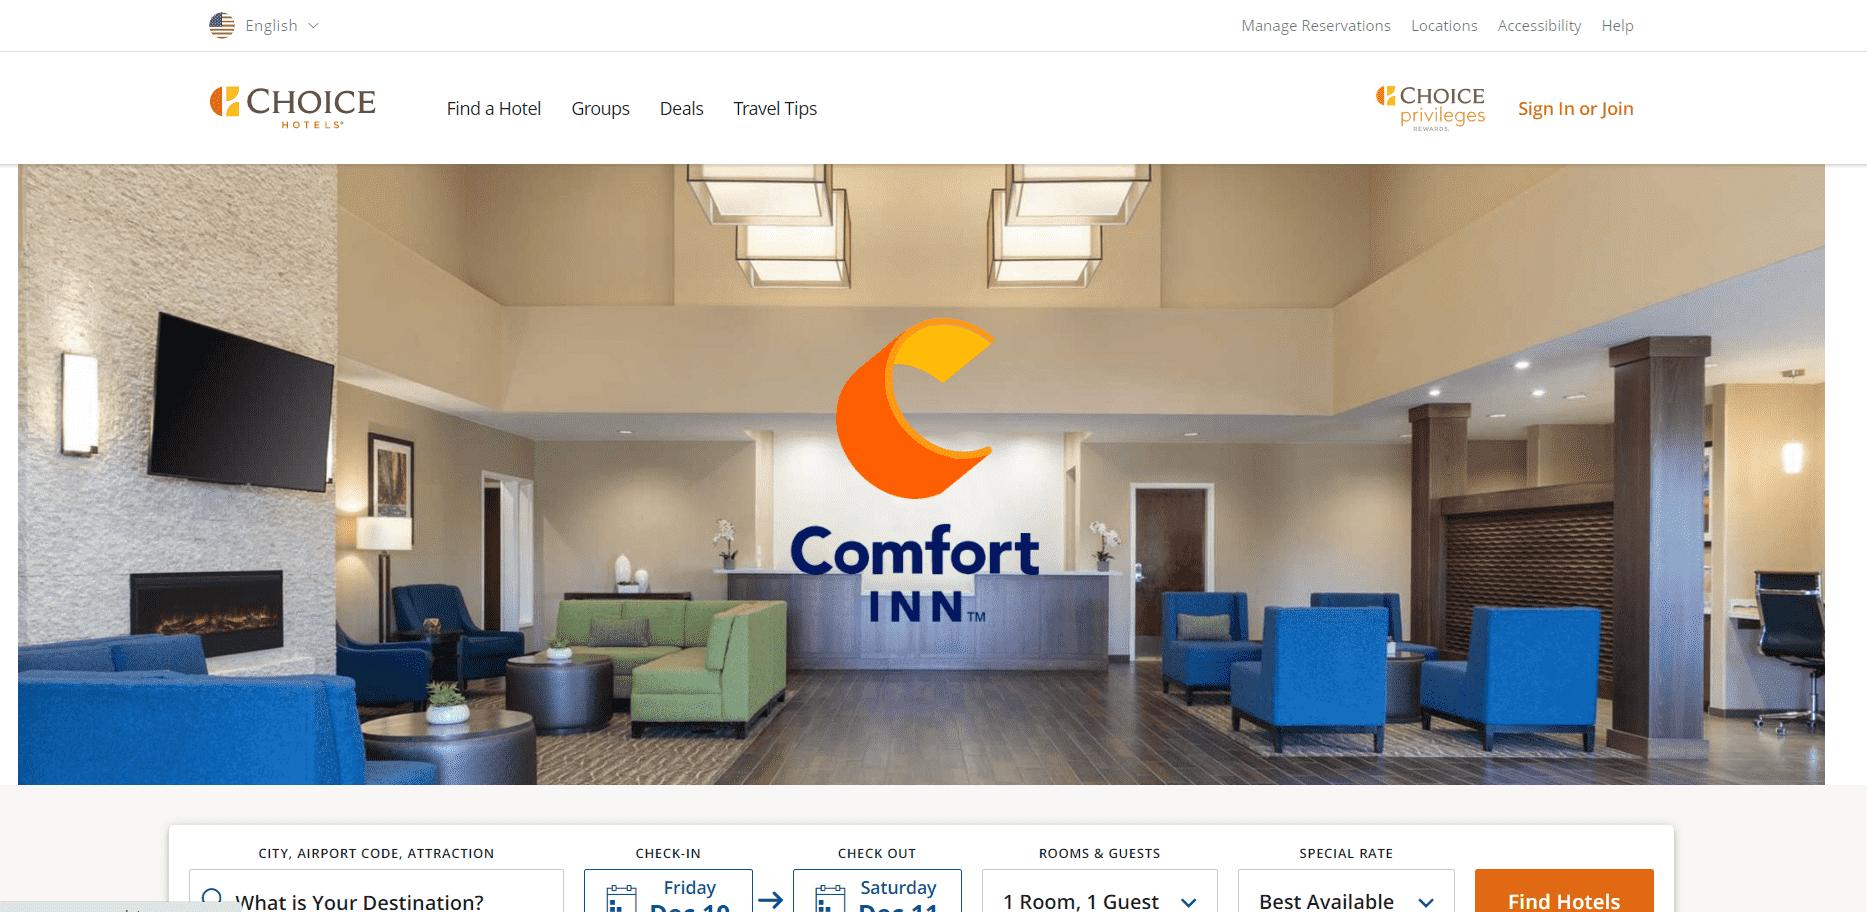 Comfort Inn reviews and complaints